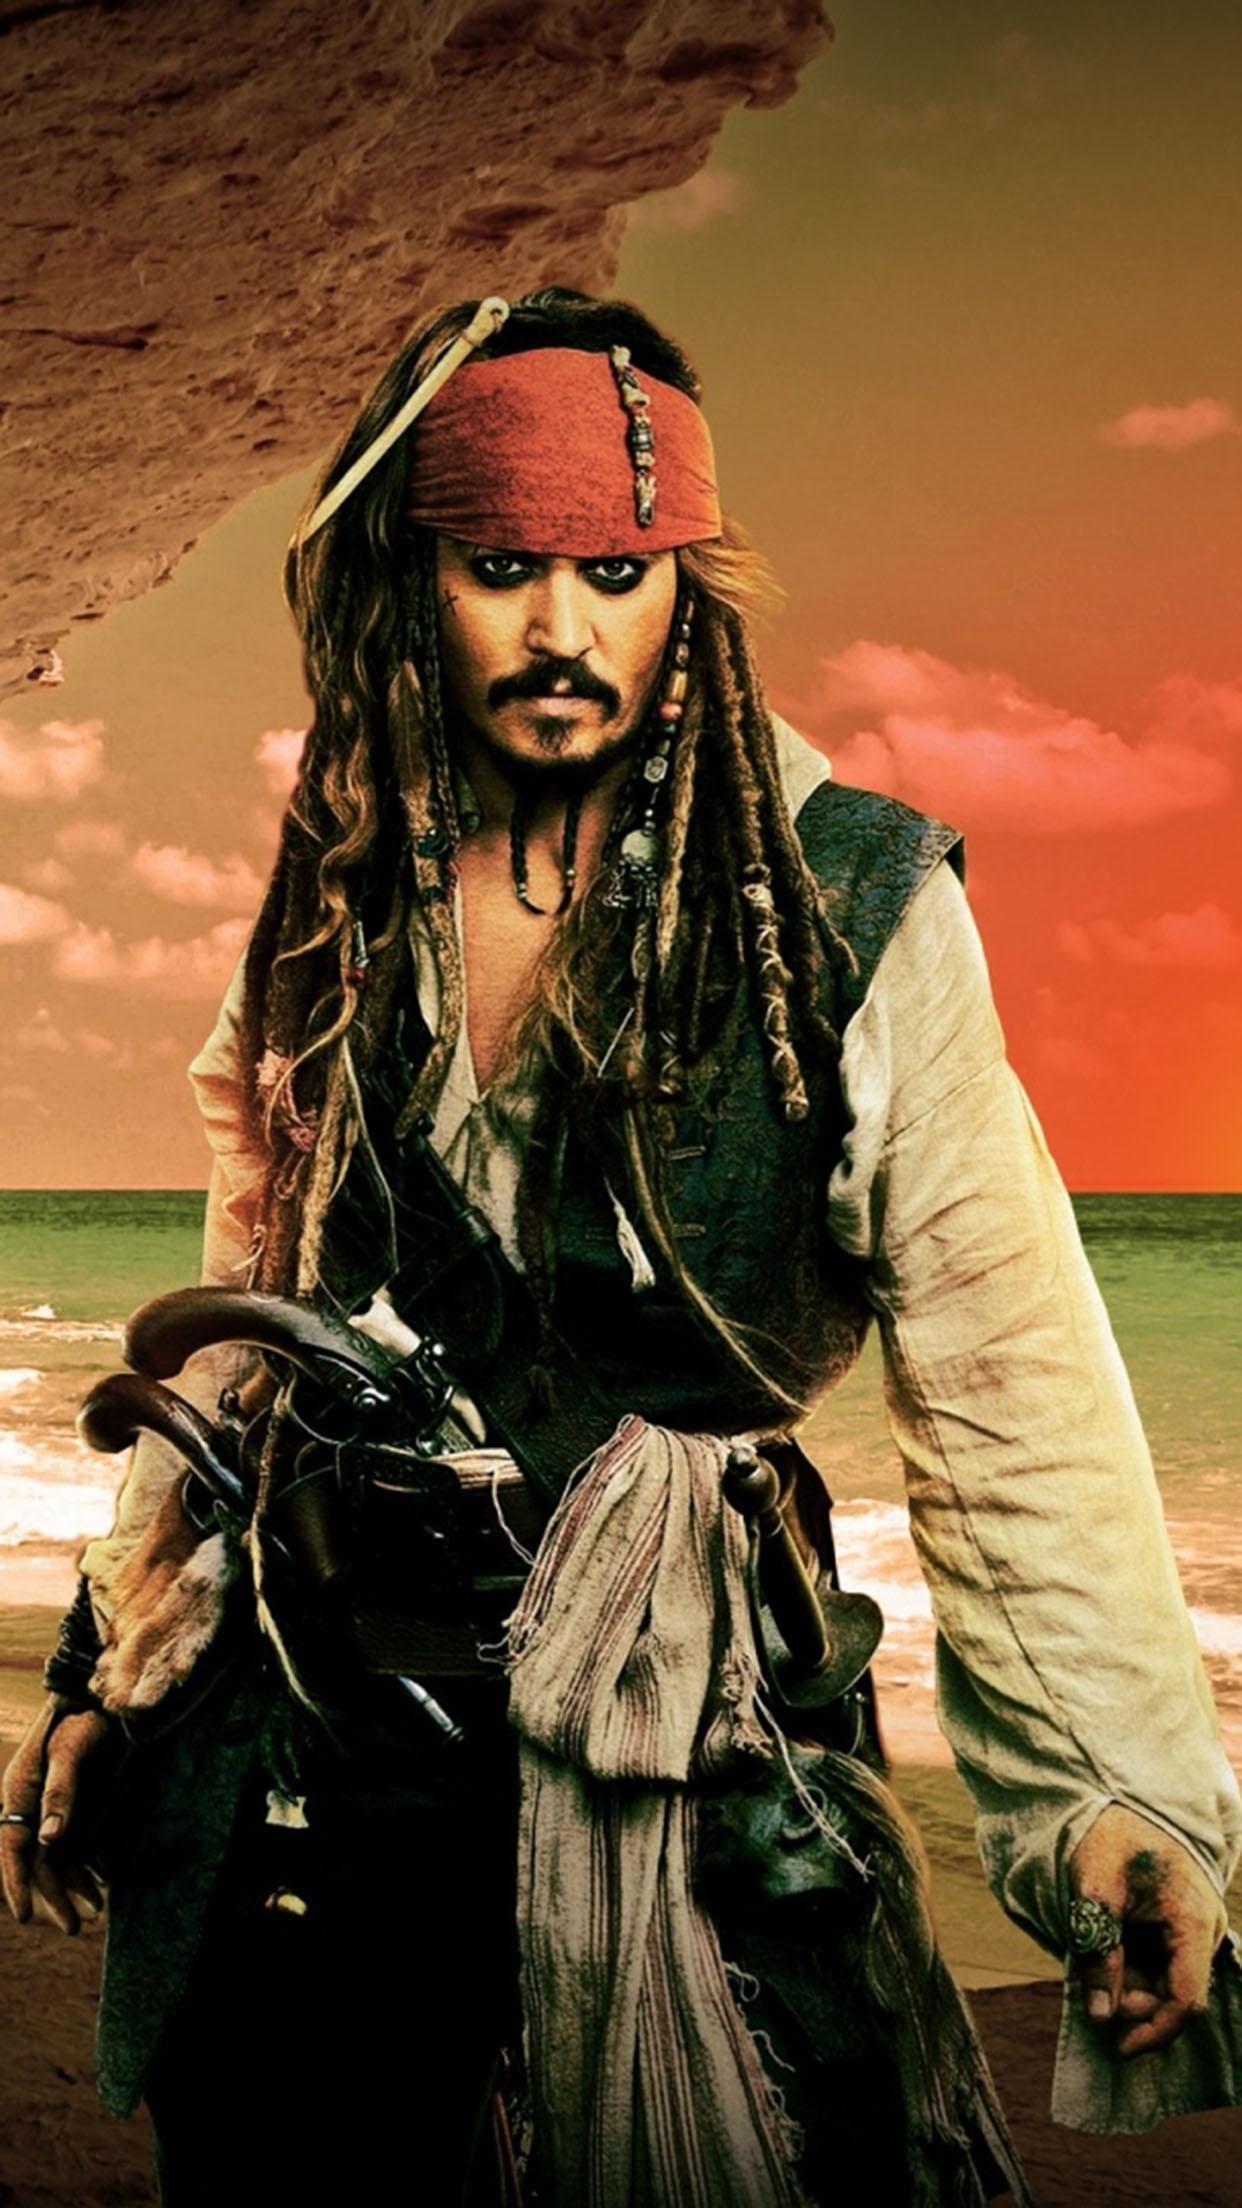 Captain Jack Sparrow Captain Jack Sparrow 3 3Wallpapers iPhone Parallax Captain Jack Sparrow 3